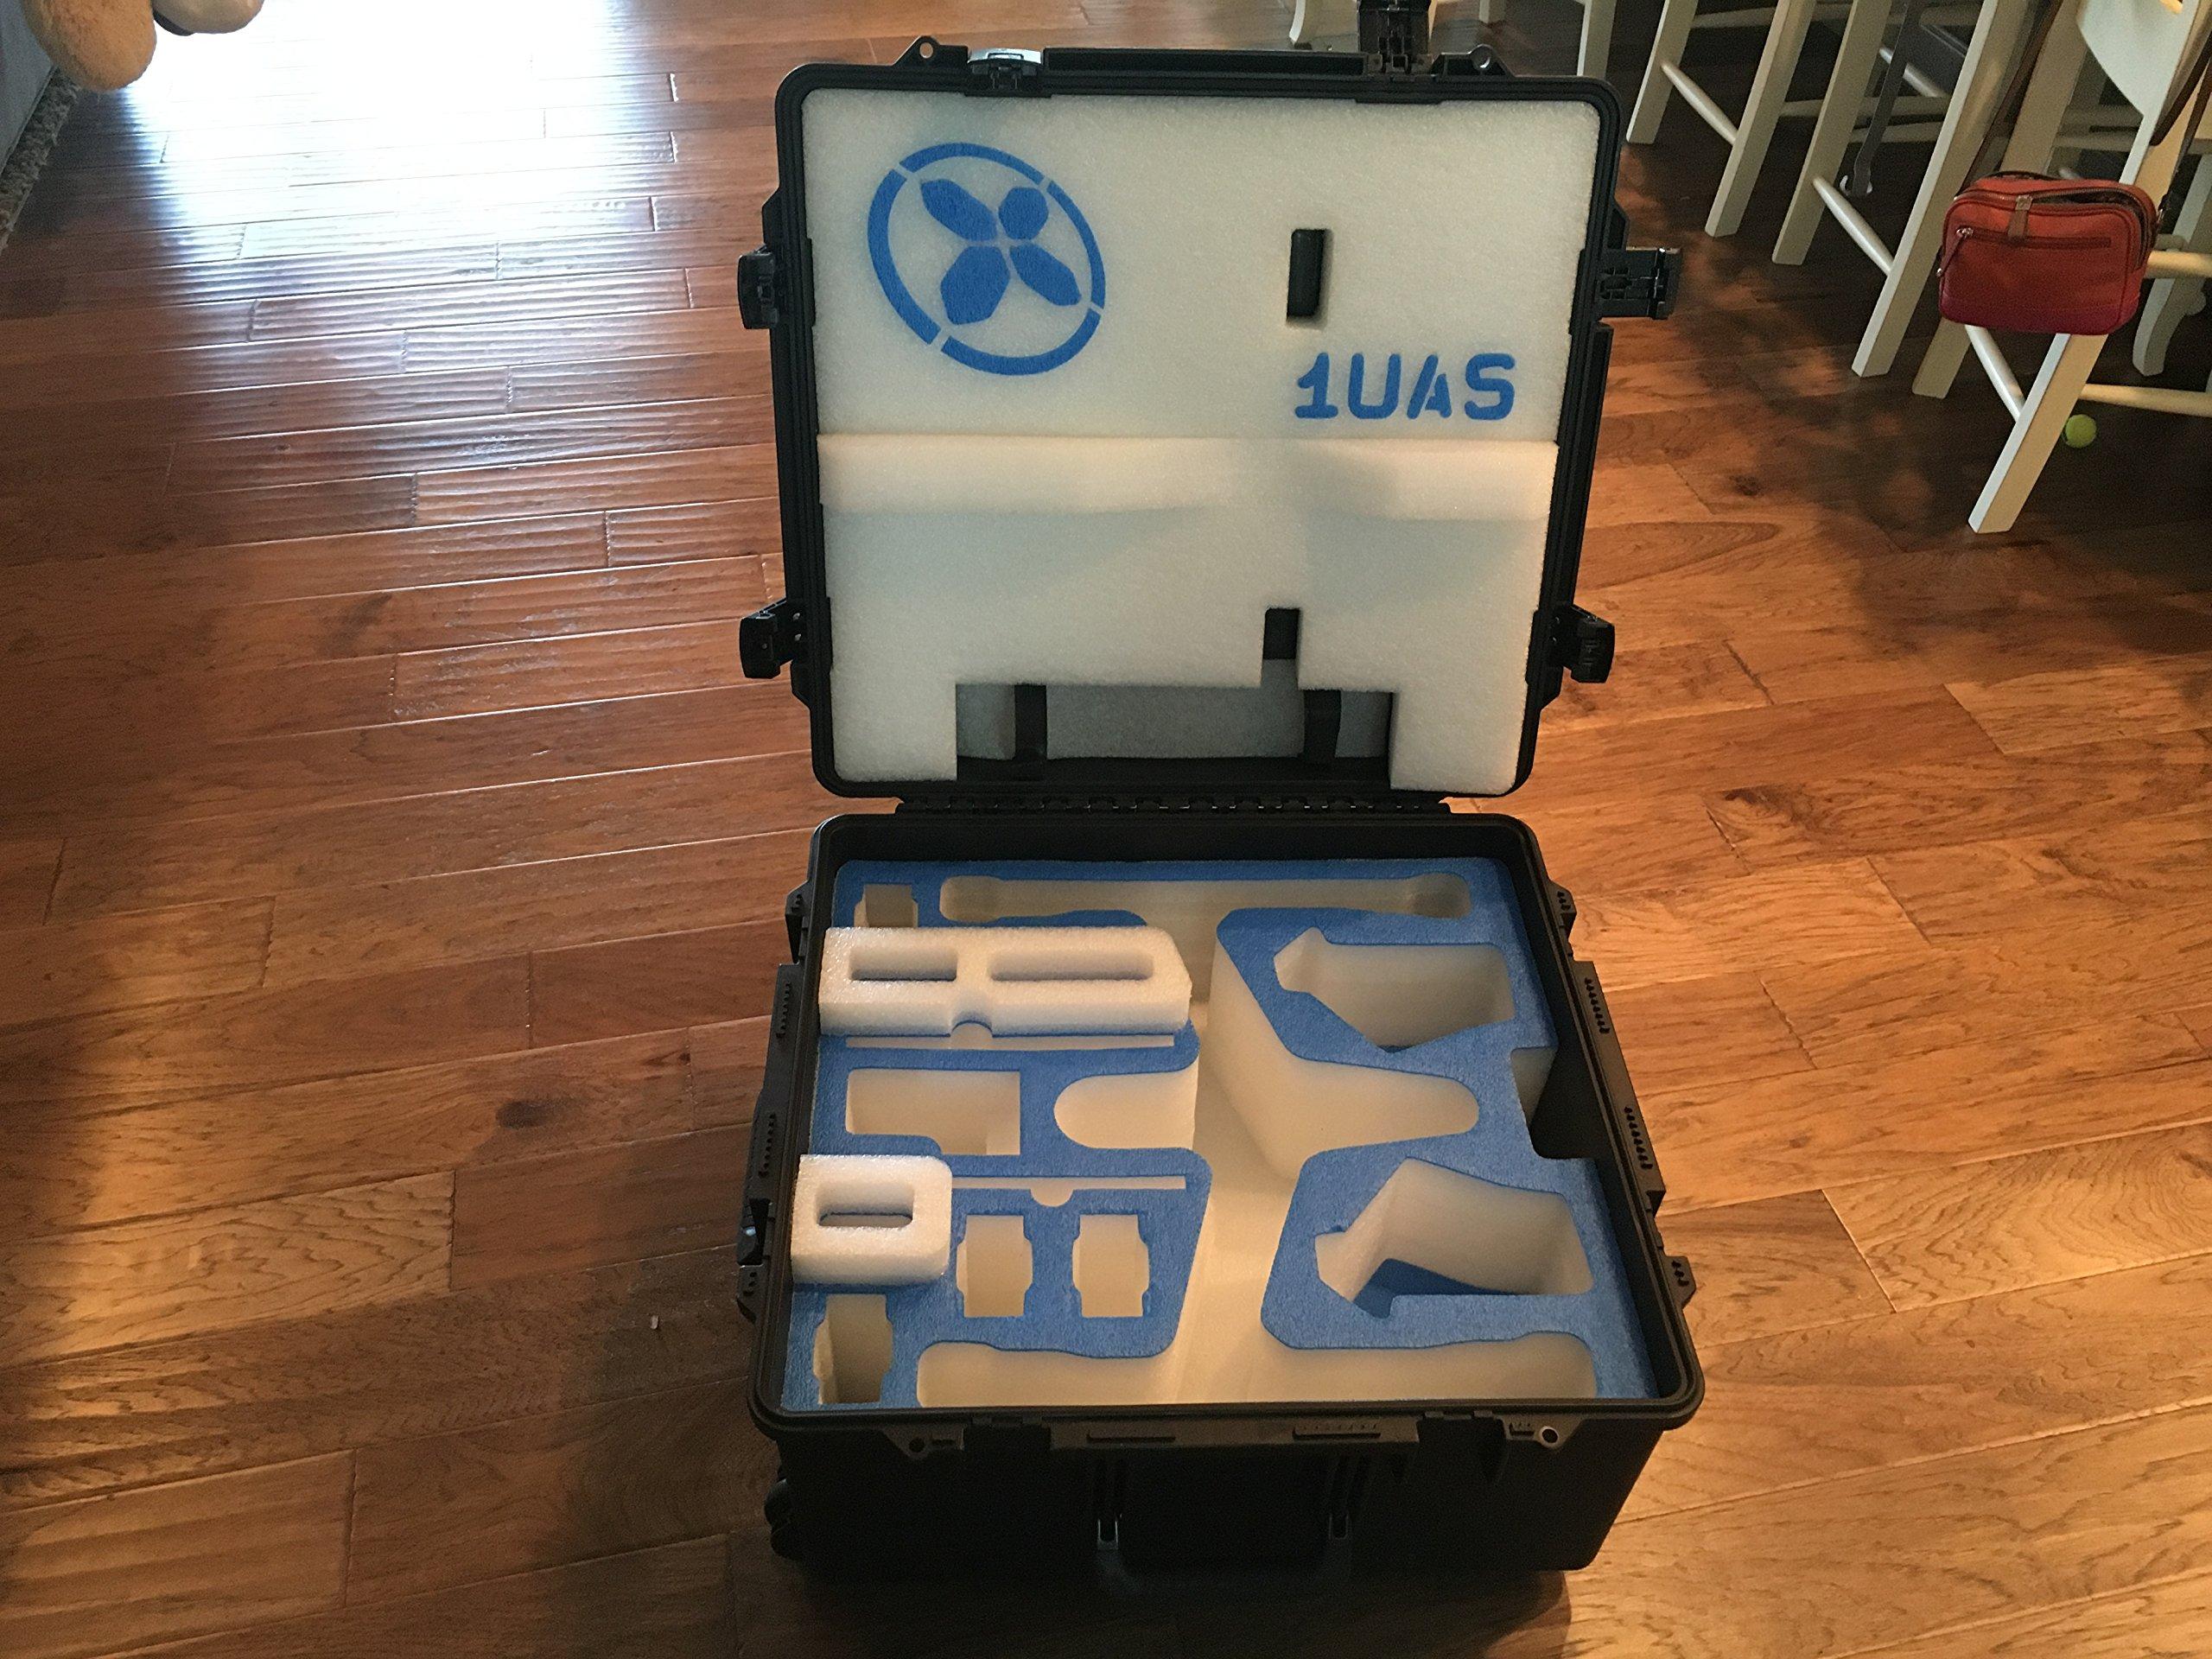 Go Professional Cases DJI Inspire 1 Travel Mode Case (GPC-DJI-INSPIRE-1-T)